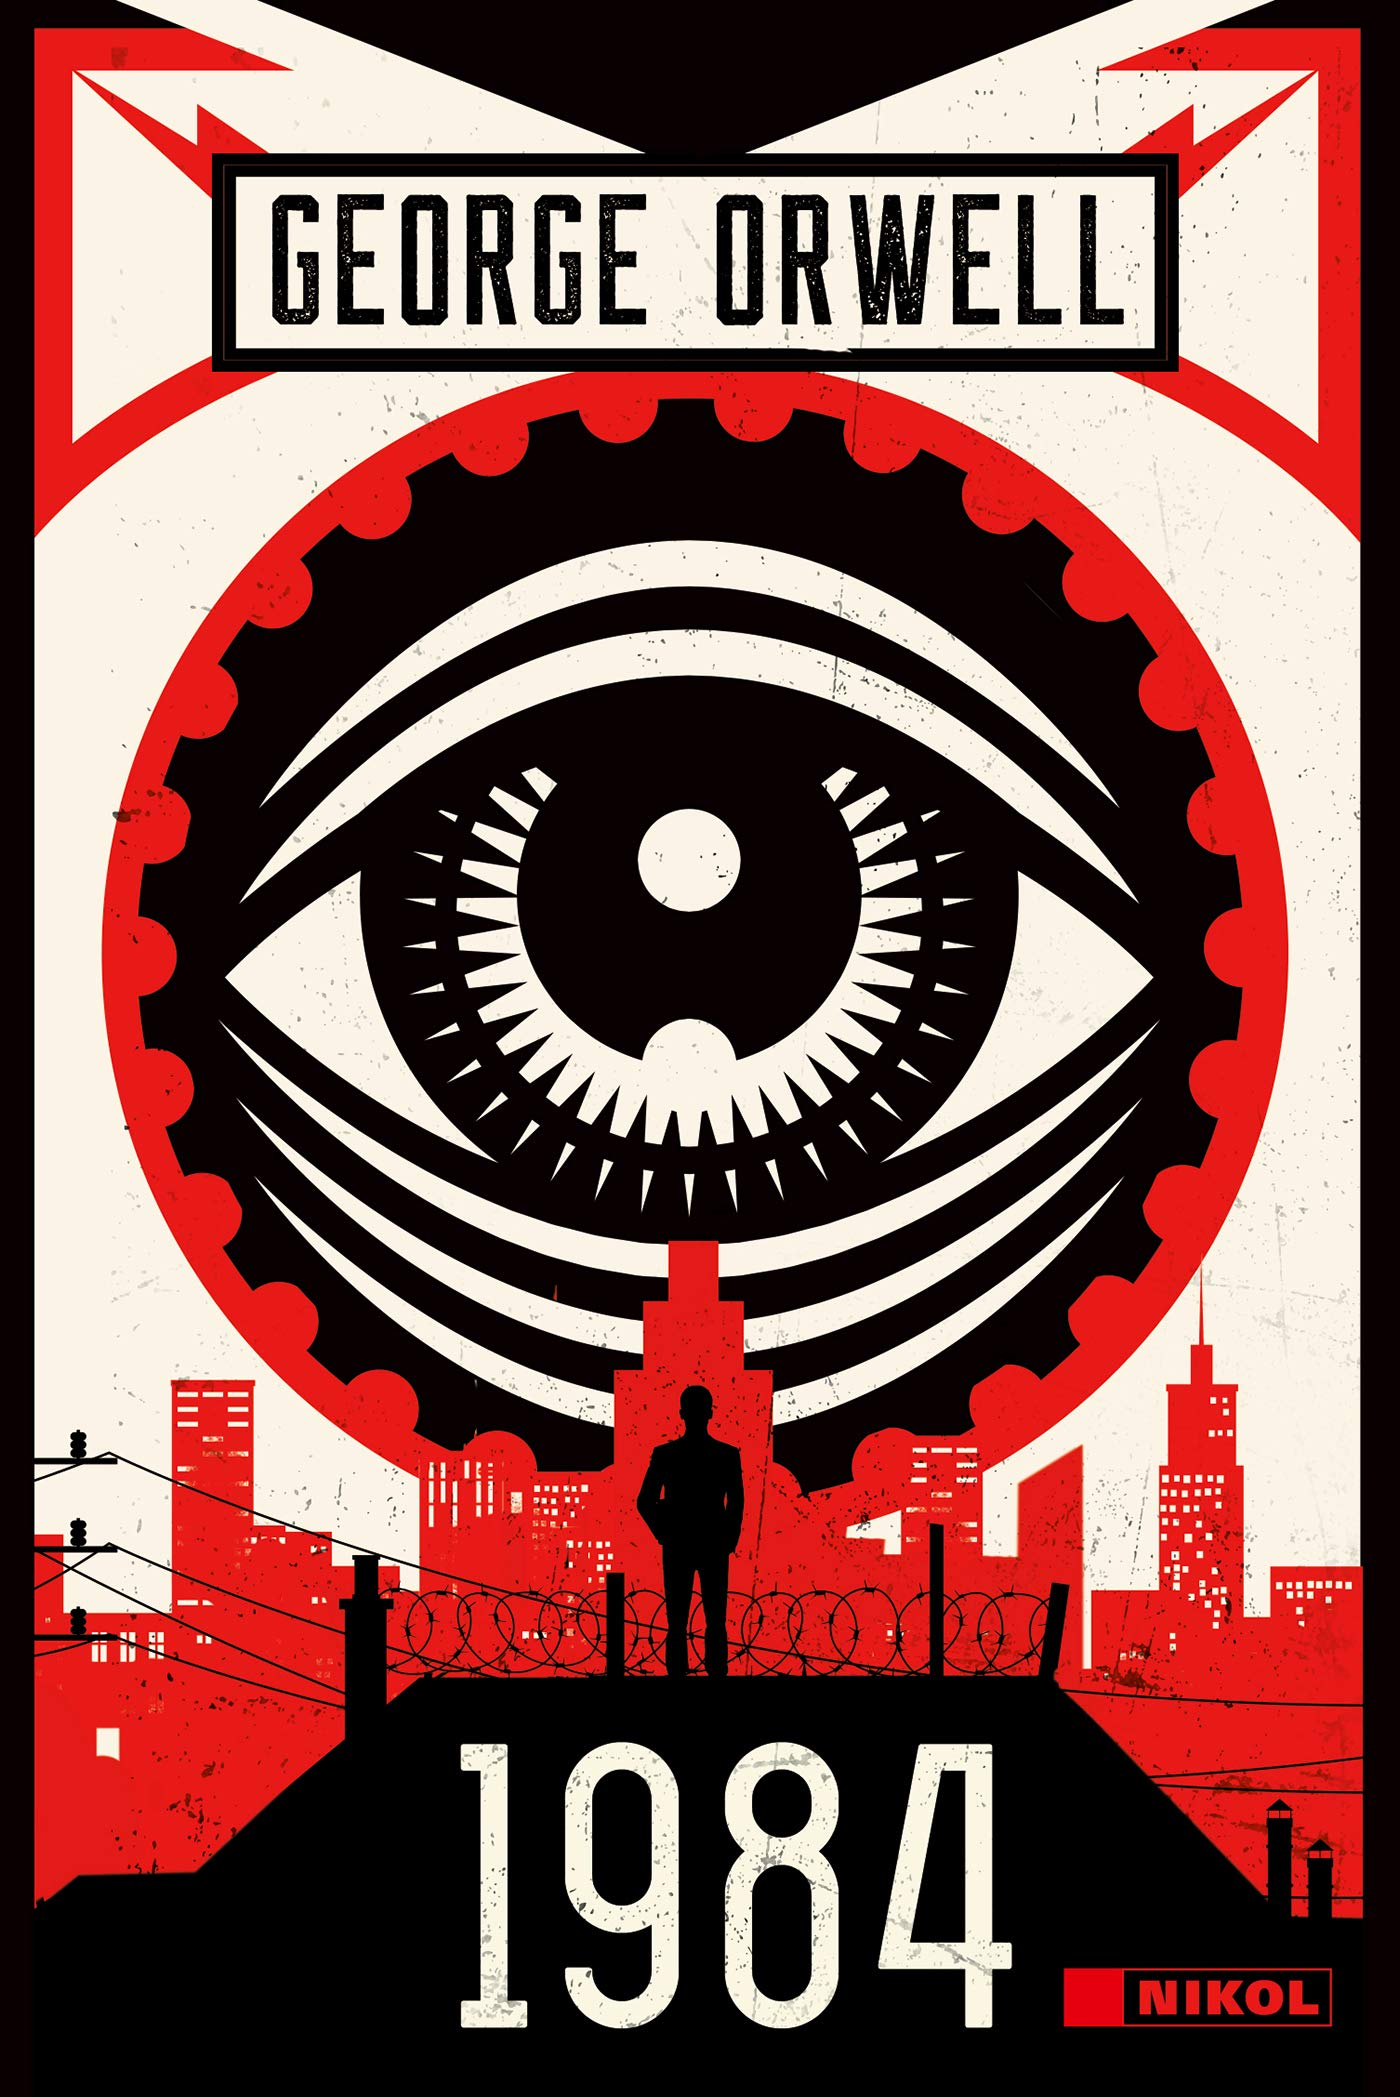 George Orwell 15 Neuübersetzung Amazon.de Orwell, George ...